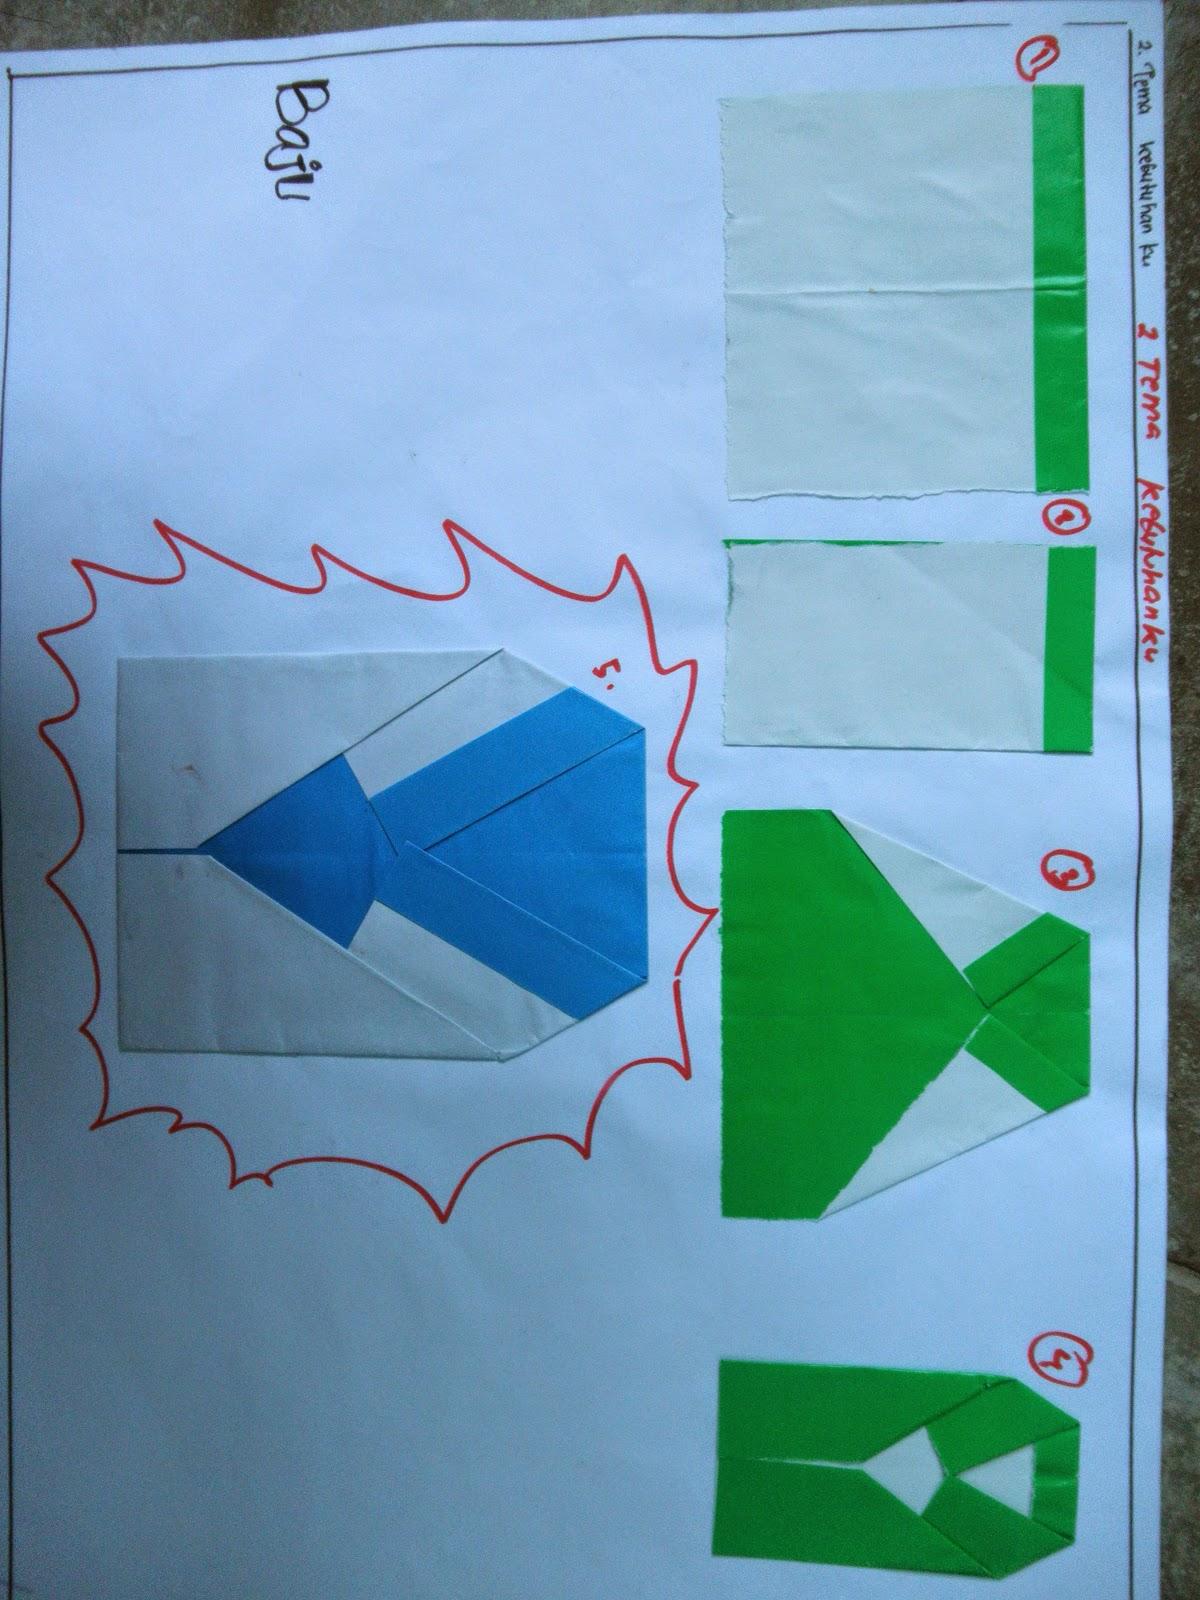 contoh origami melipat kertas untuk PAUD berdasarkan